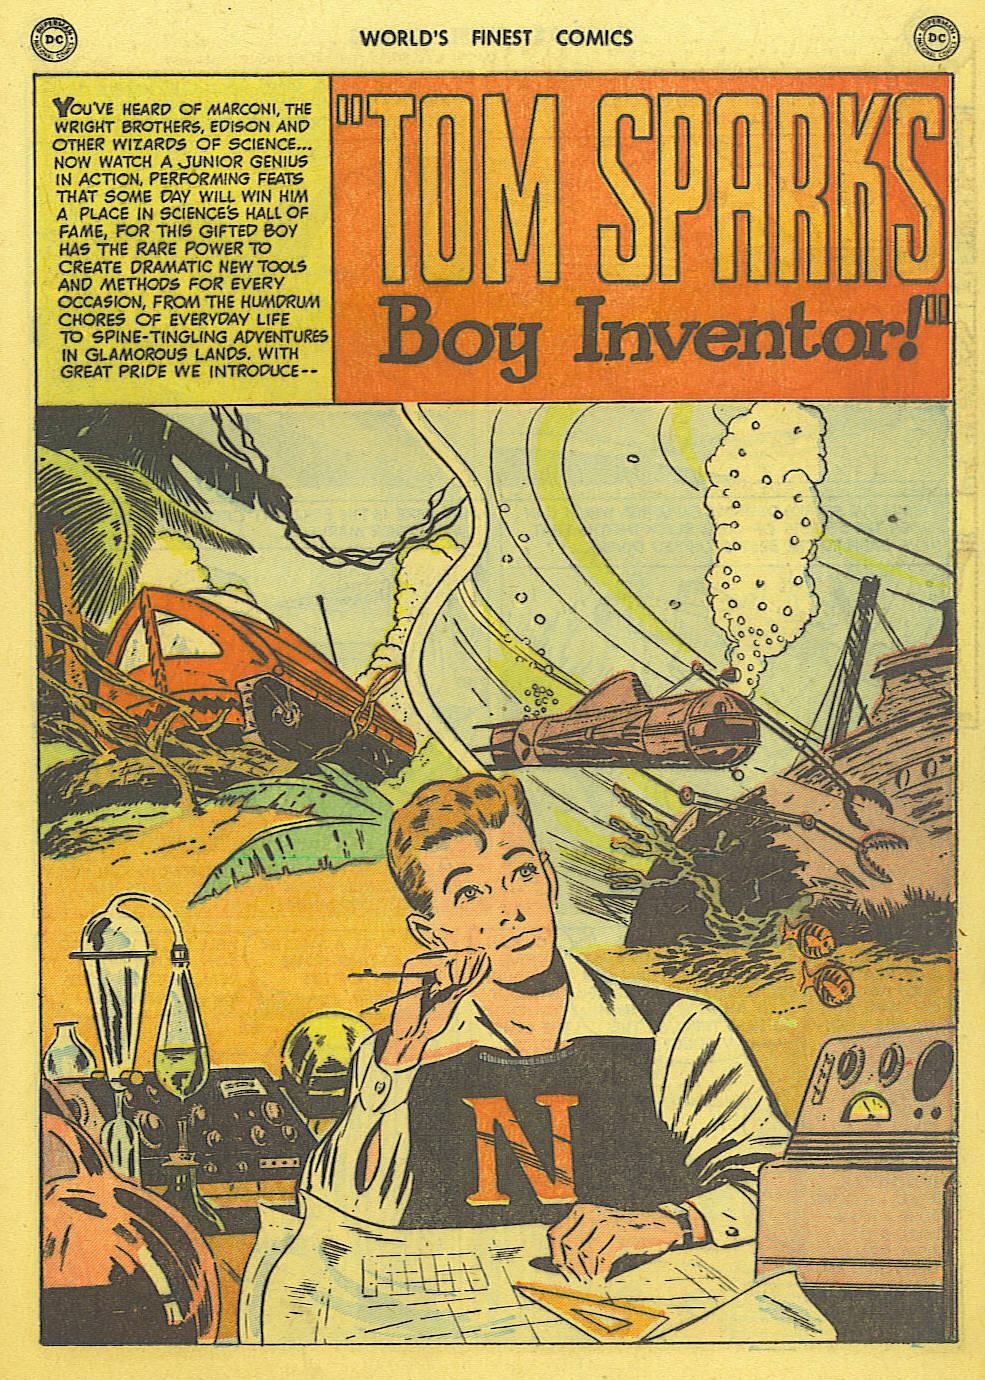 Read online World's Finest Comics comic -  Issue #49 - 30